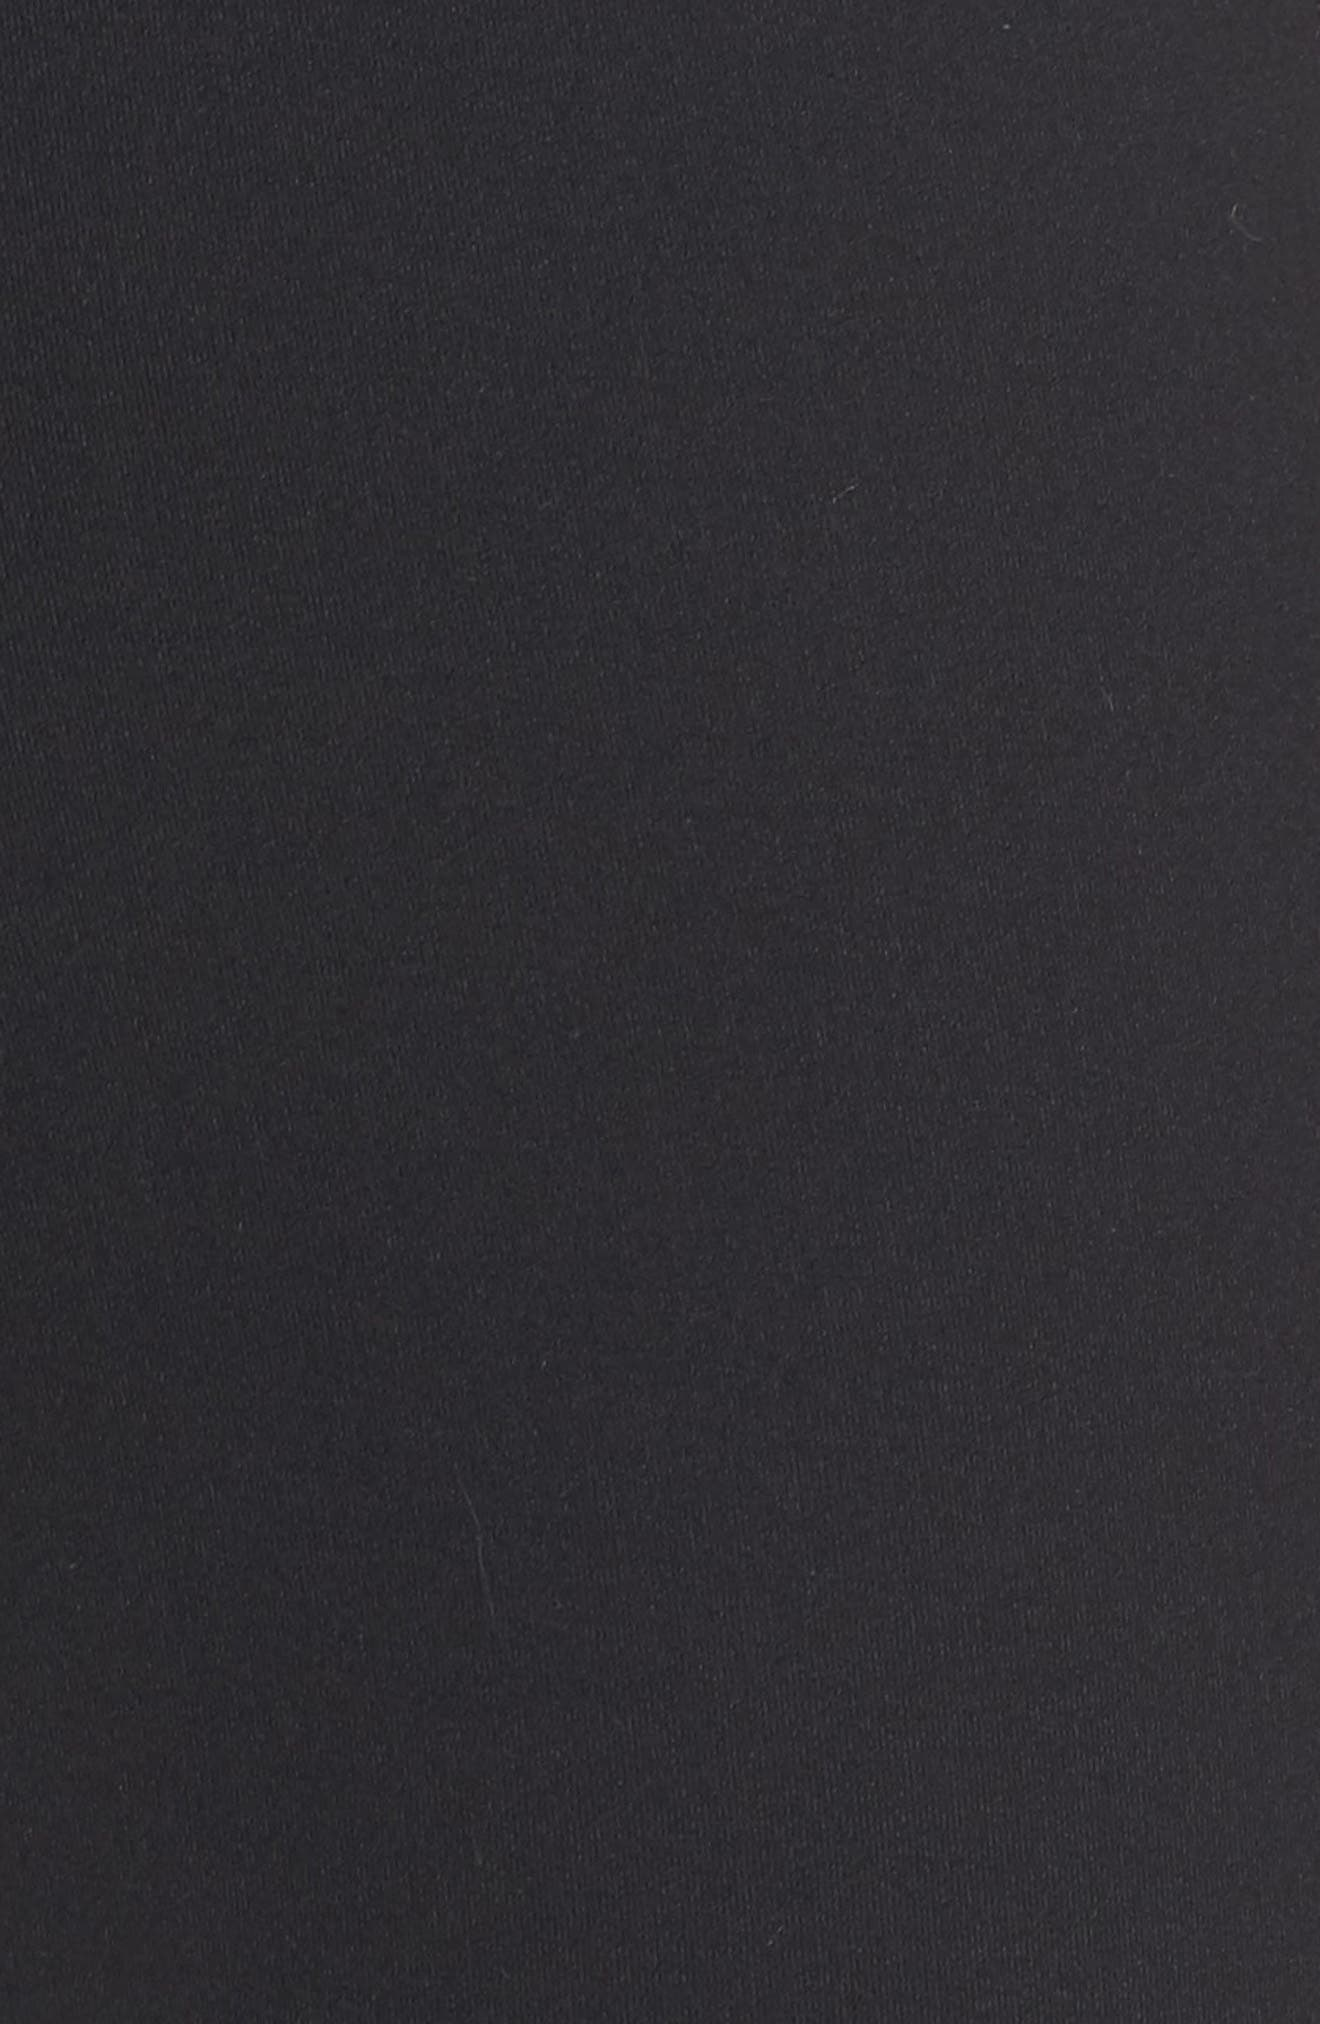 Greenlight High Waist Capris,                             Alternate thumbnail 6, color,                             Black